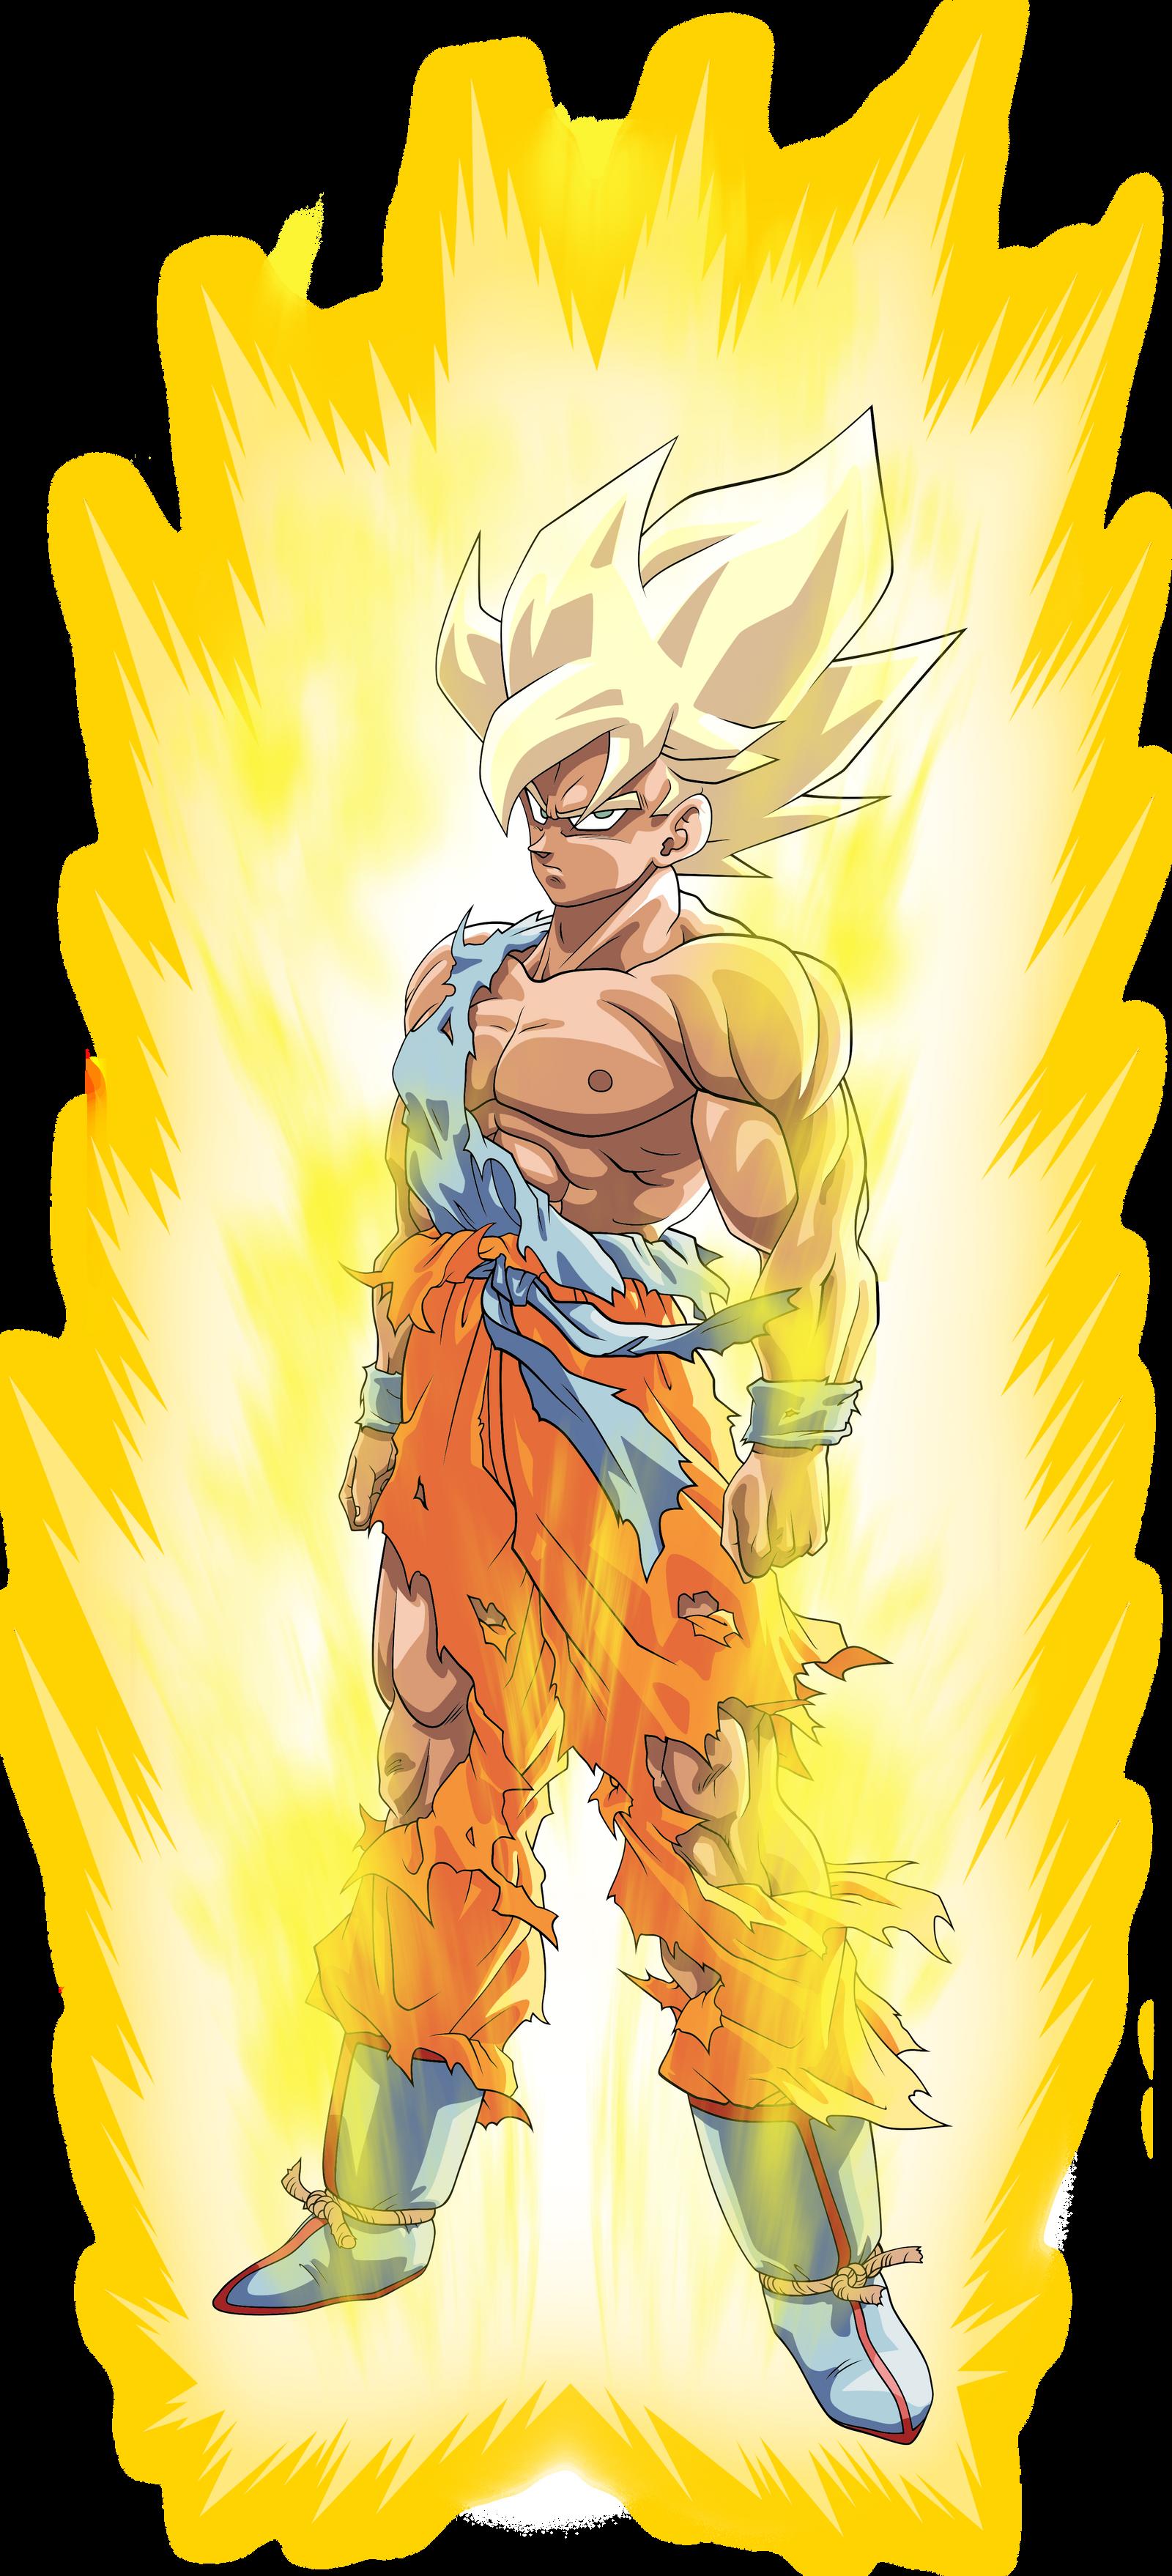 Goku ssj namek ssj toriyama aura palette by benj san on deviantart - Super san dragon ball z ...